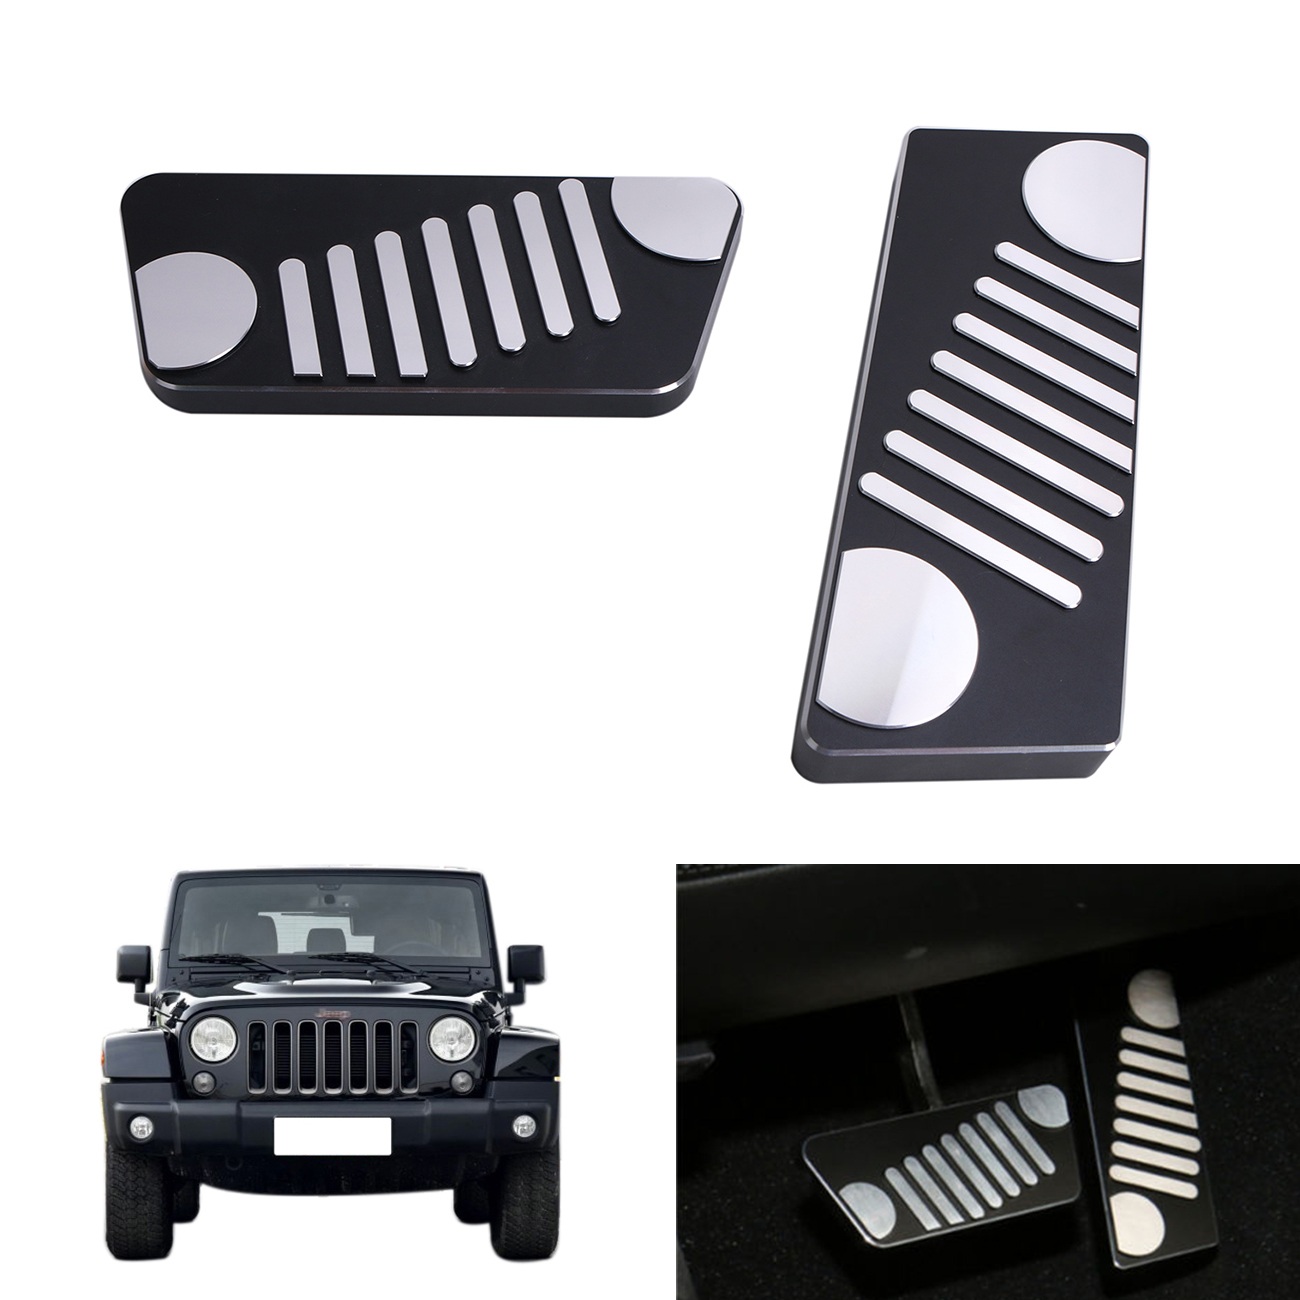 small resolution of black aluminum alloy accelerator gas brake pedal kit for jeep wrangler jk rubicon sahara sport 2009 2016 left hand drive ce037